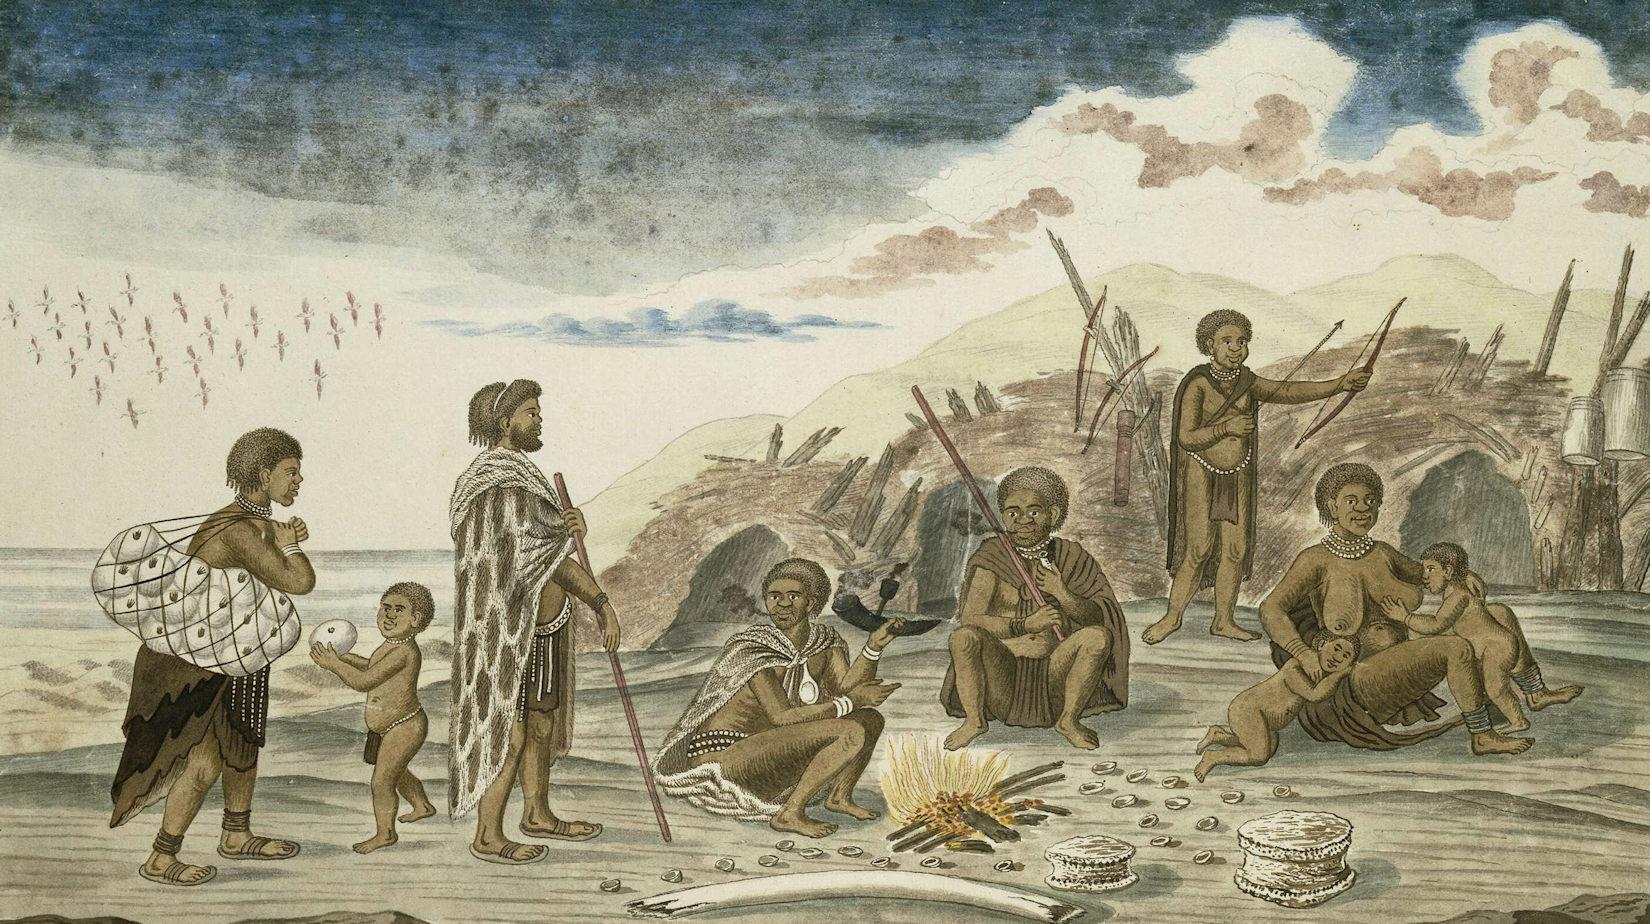 Strandlopers and their shelters on the beach - Robert Jacob Gordon